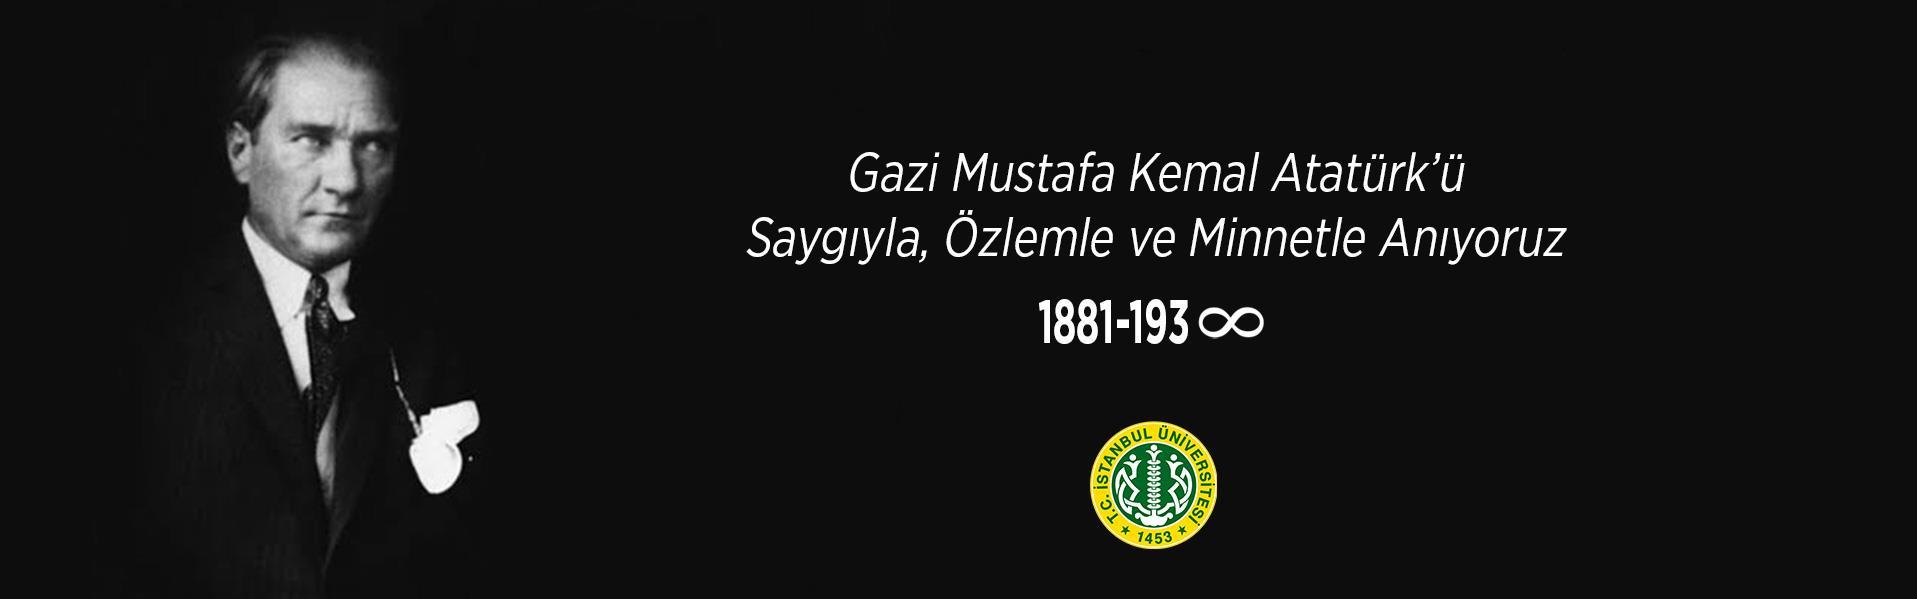 Gazi Atatürk